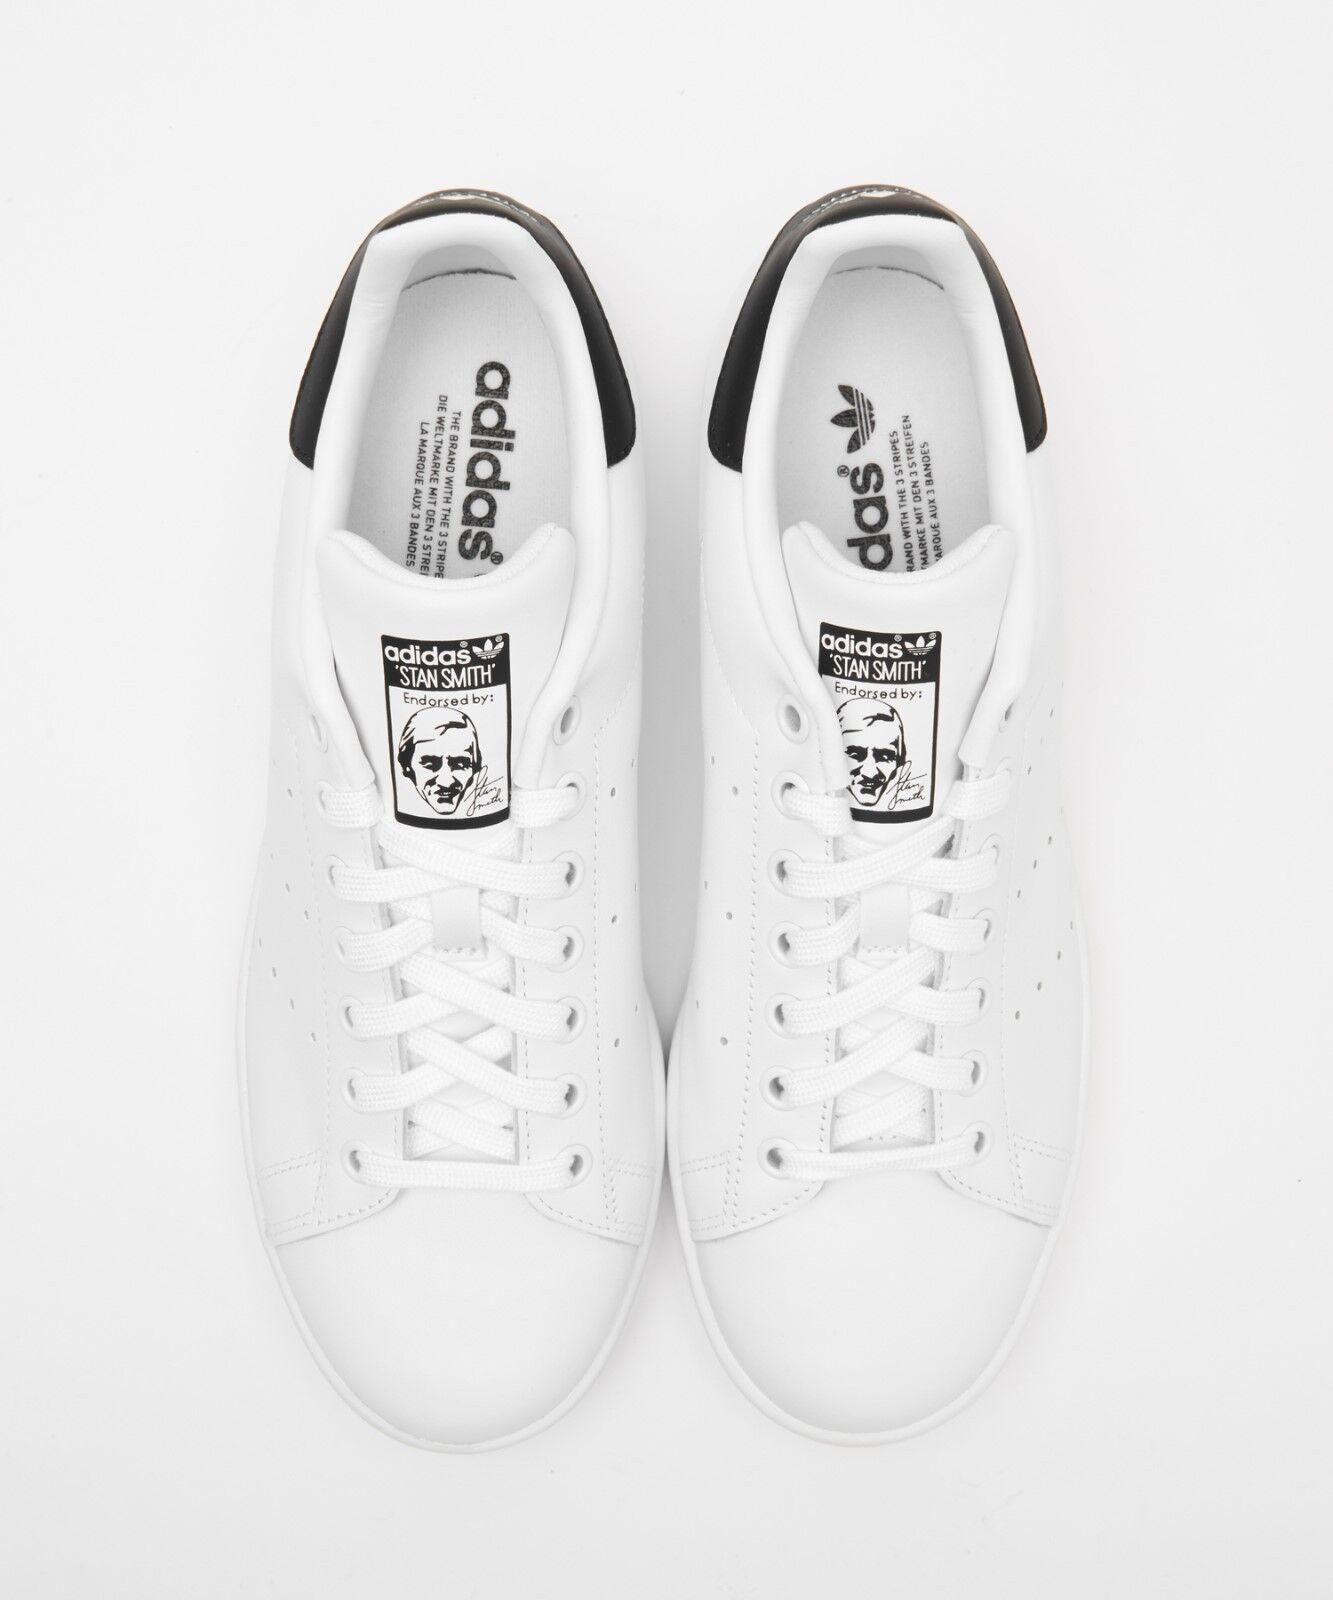 Chaussures ADIDAS STANSMITH Noir Blanc AQ0438 Etats-Unis Homme Taille 4-11